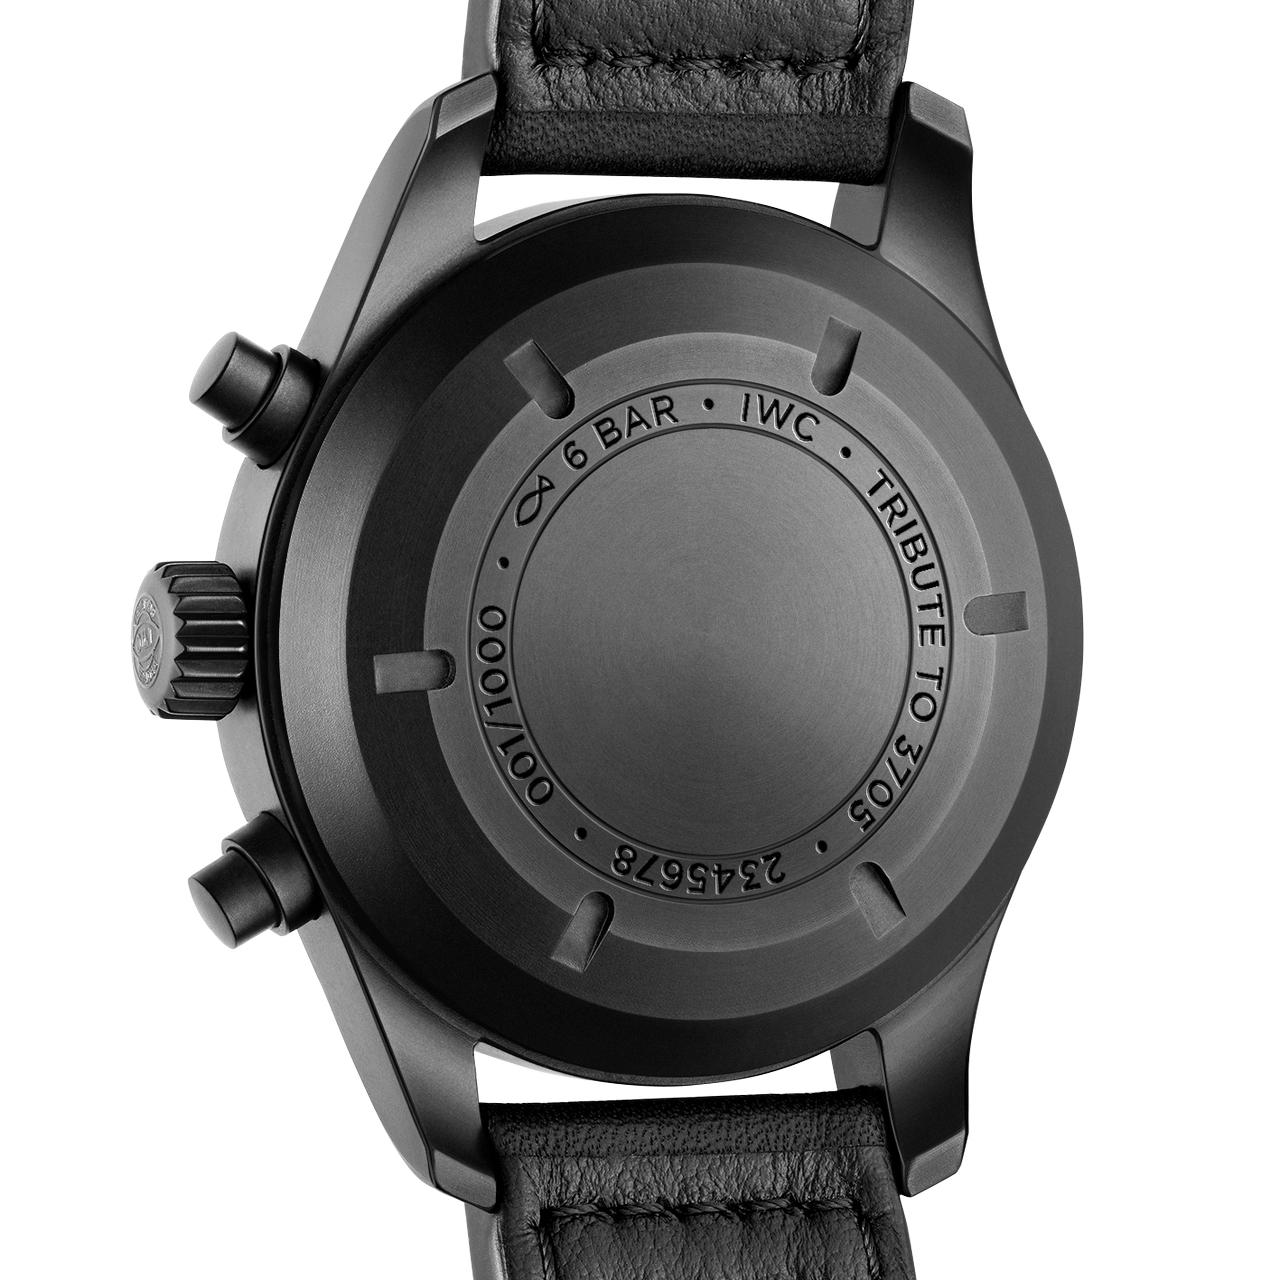 "IWC Pilot's Watch Chronograph Edition ""Tribute to 3705"" - semmi extra hátul, sajnos"